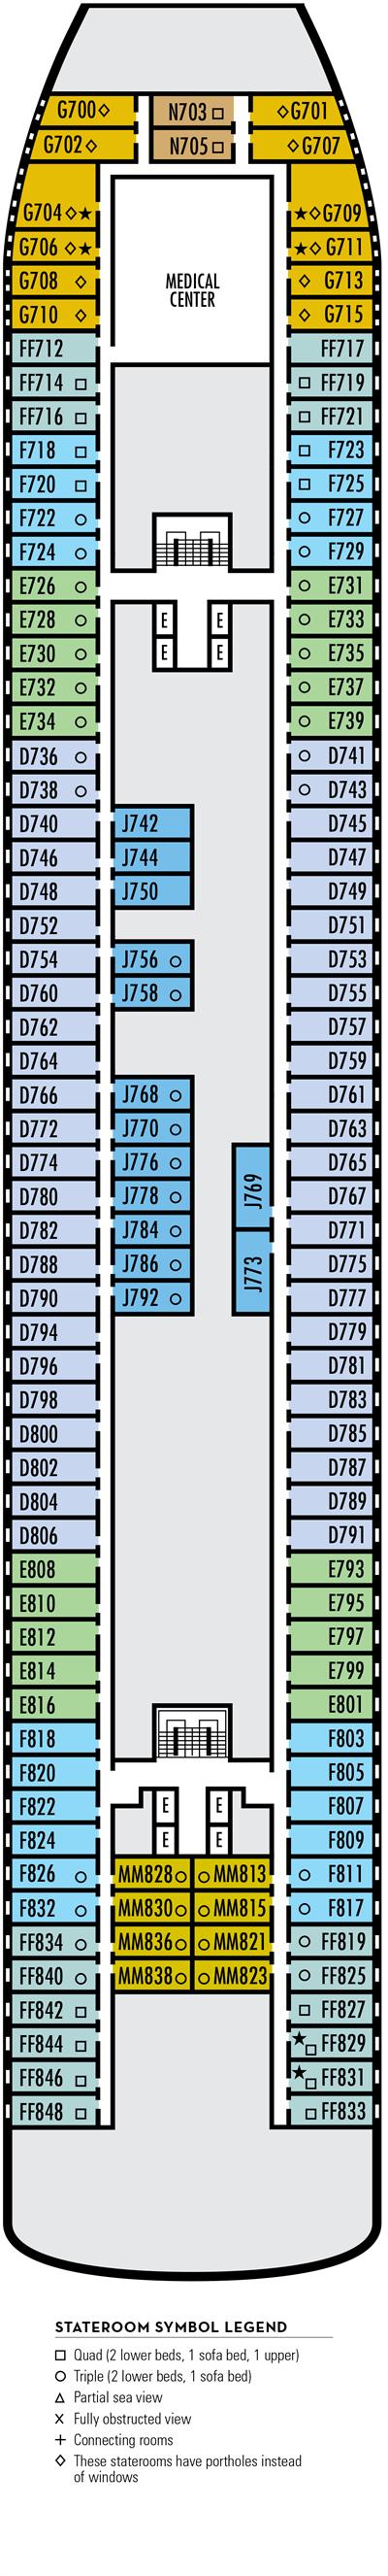 Deck 4 - HAL's Maasdam